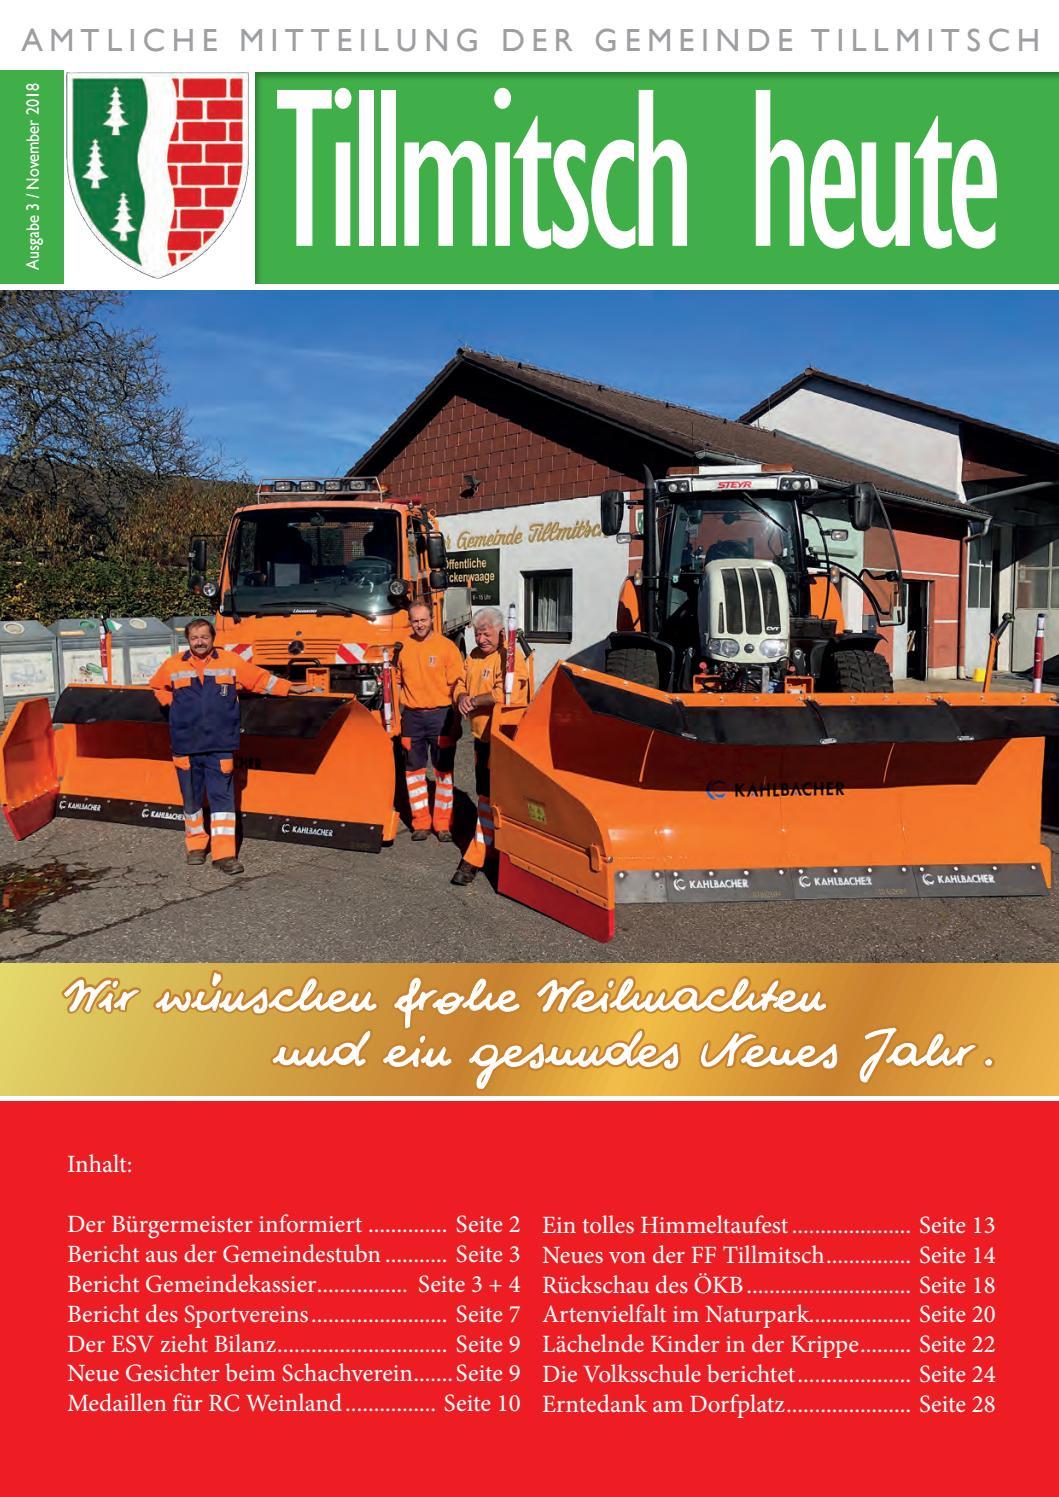 Kolumne: Willkommen in Tillmitsch - Leibnitz - forsale24.net